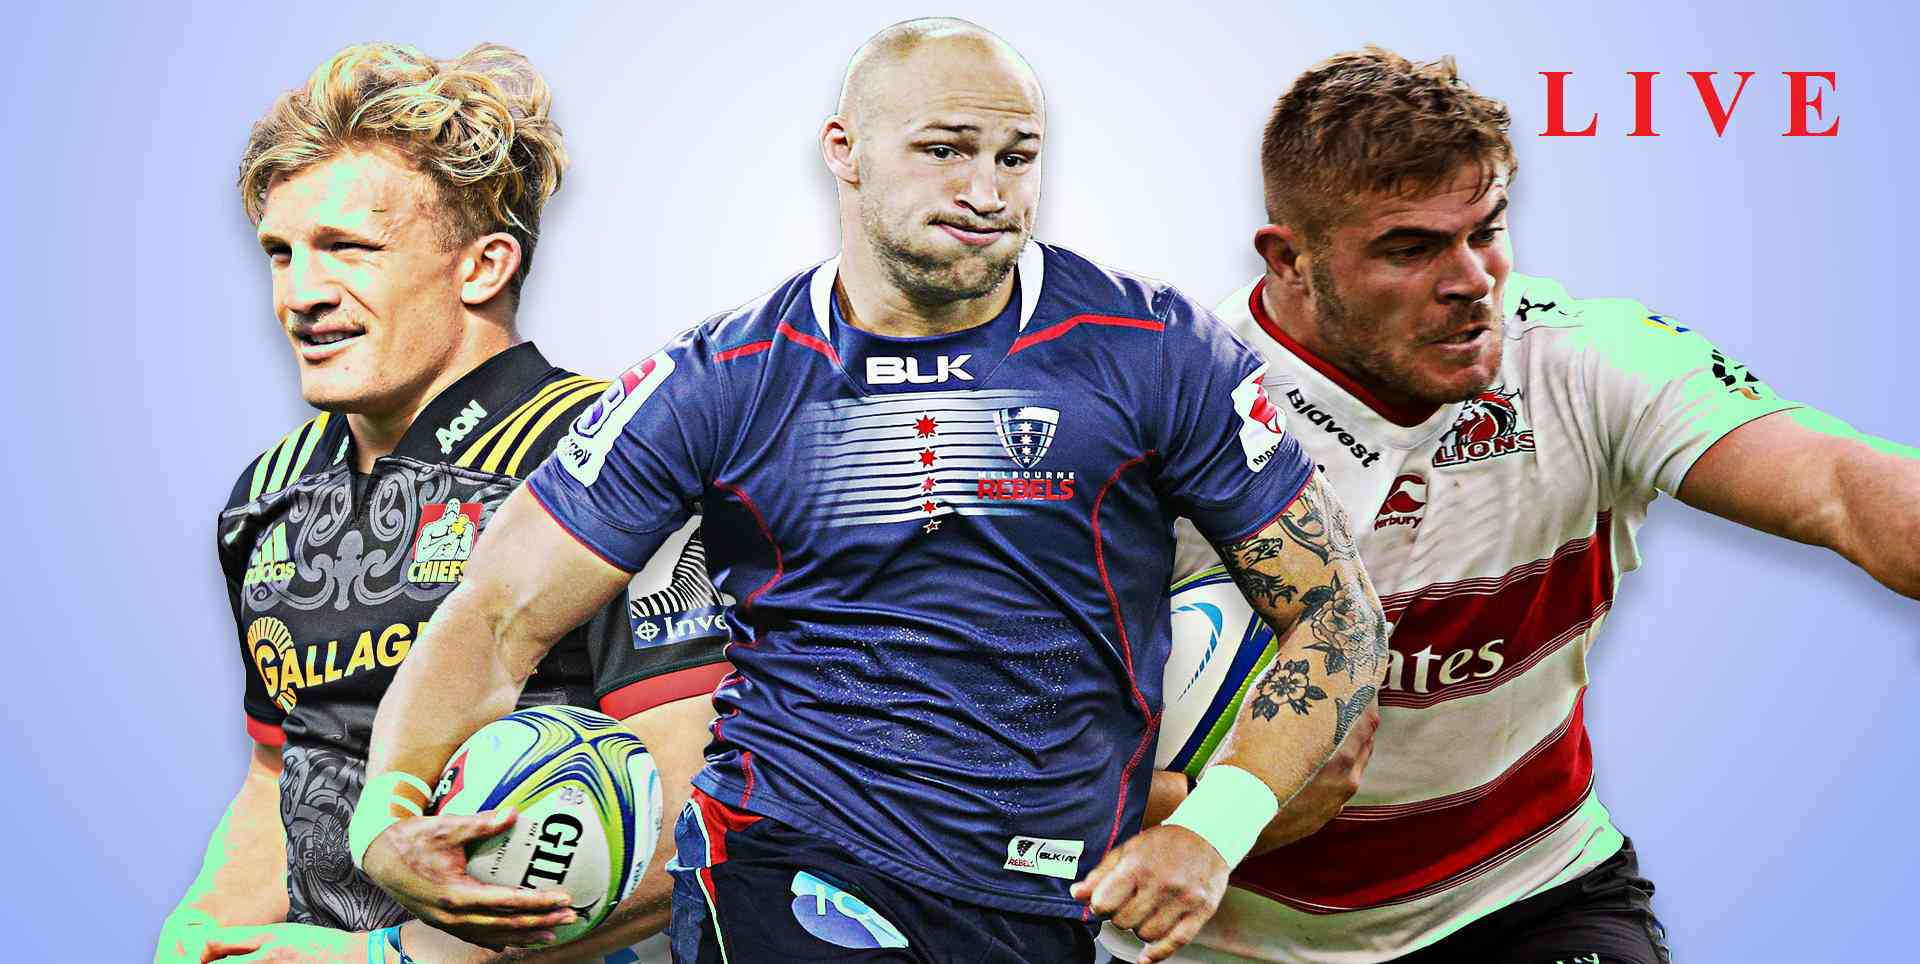 cheetahs-vs-blue-bulls-rugby-live